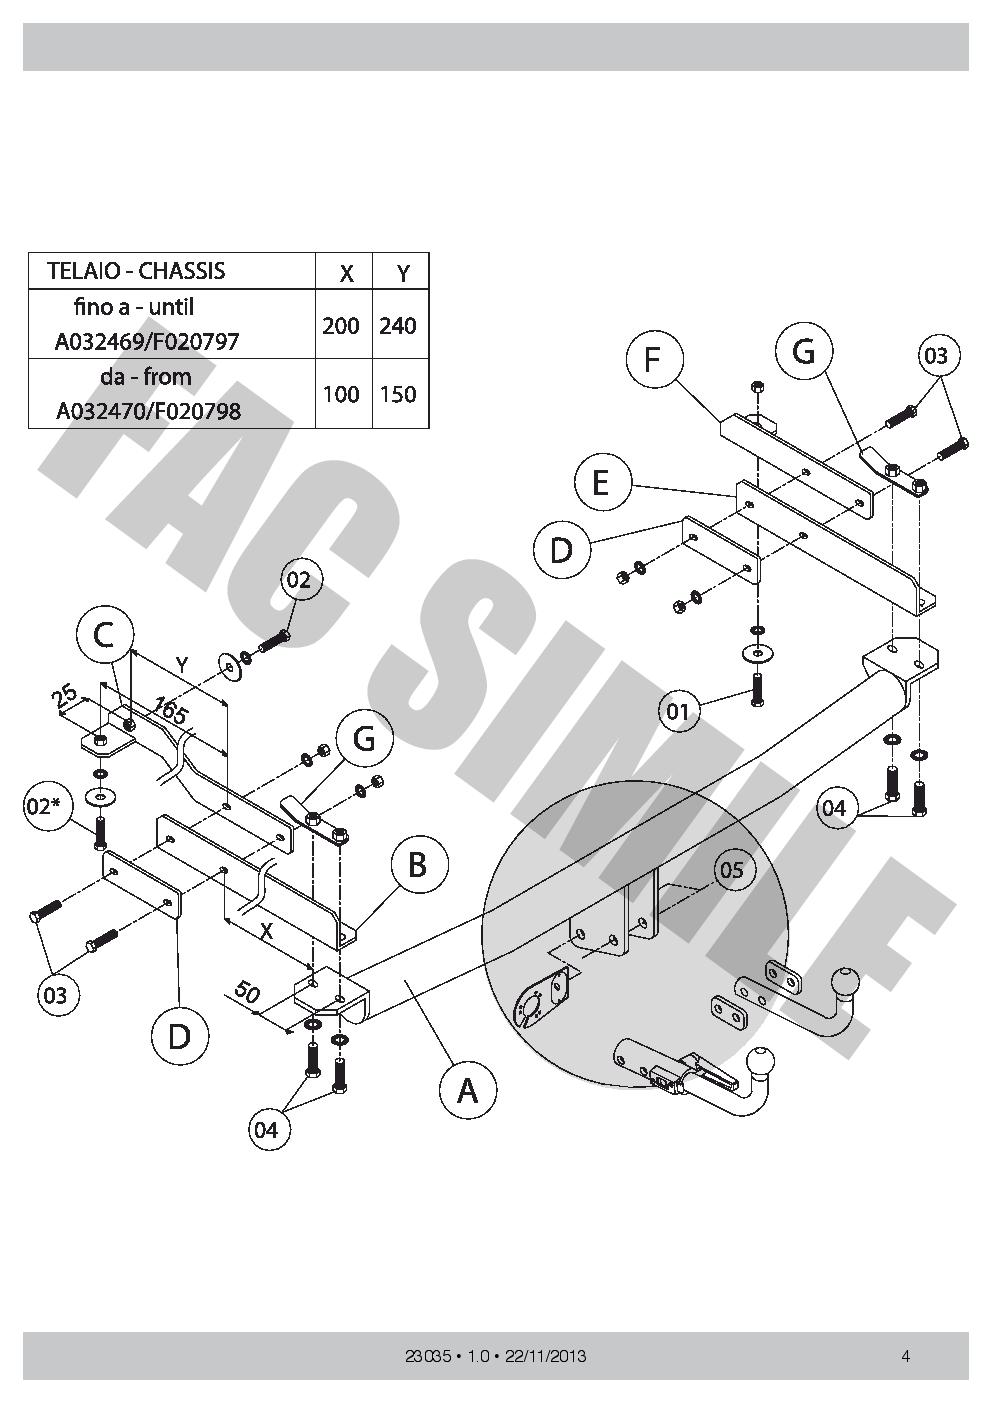 Swan Neck Towbar For Mercedes CLK 7 Pin Electrics Cabrio 97-04 23035/_H7